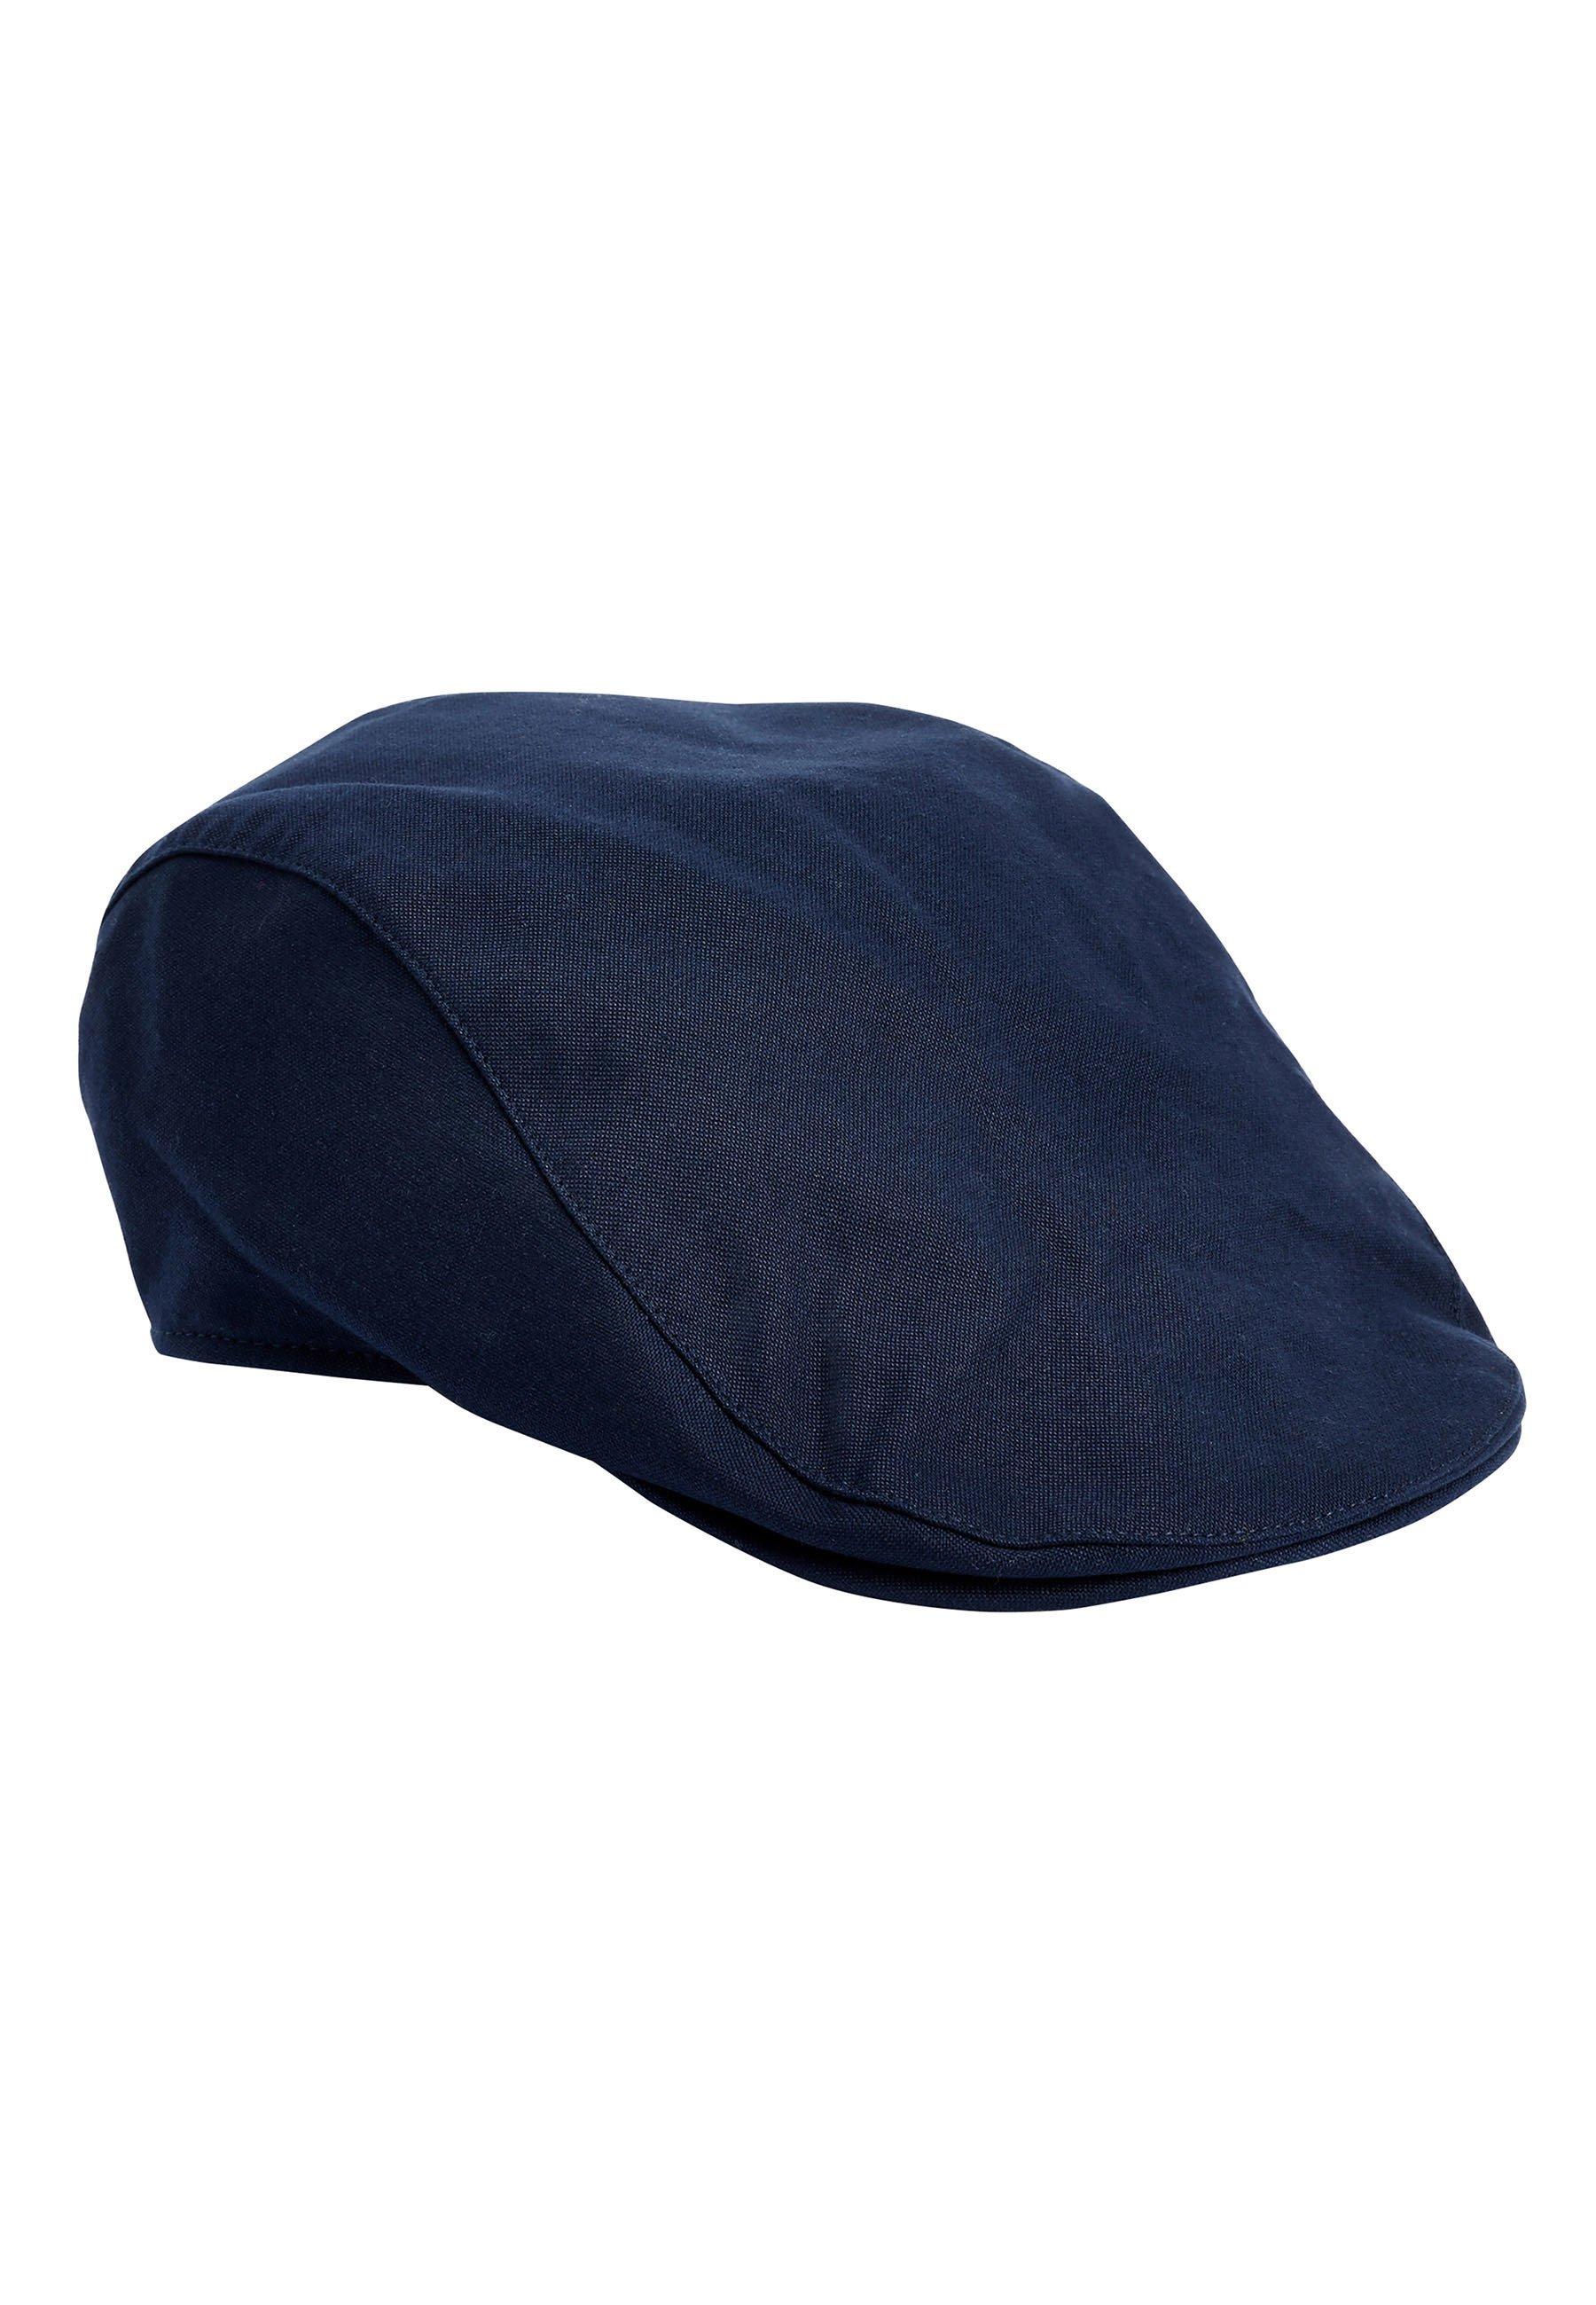 Kinder NAVY CHAMBRAY FLAT CAP (OLDER) - Cap